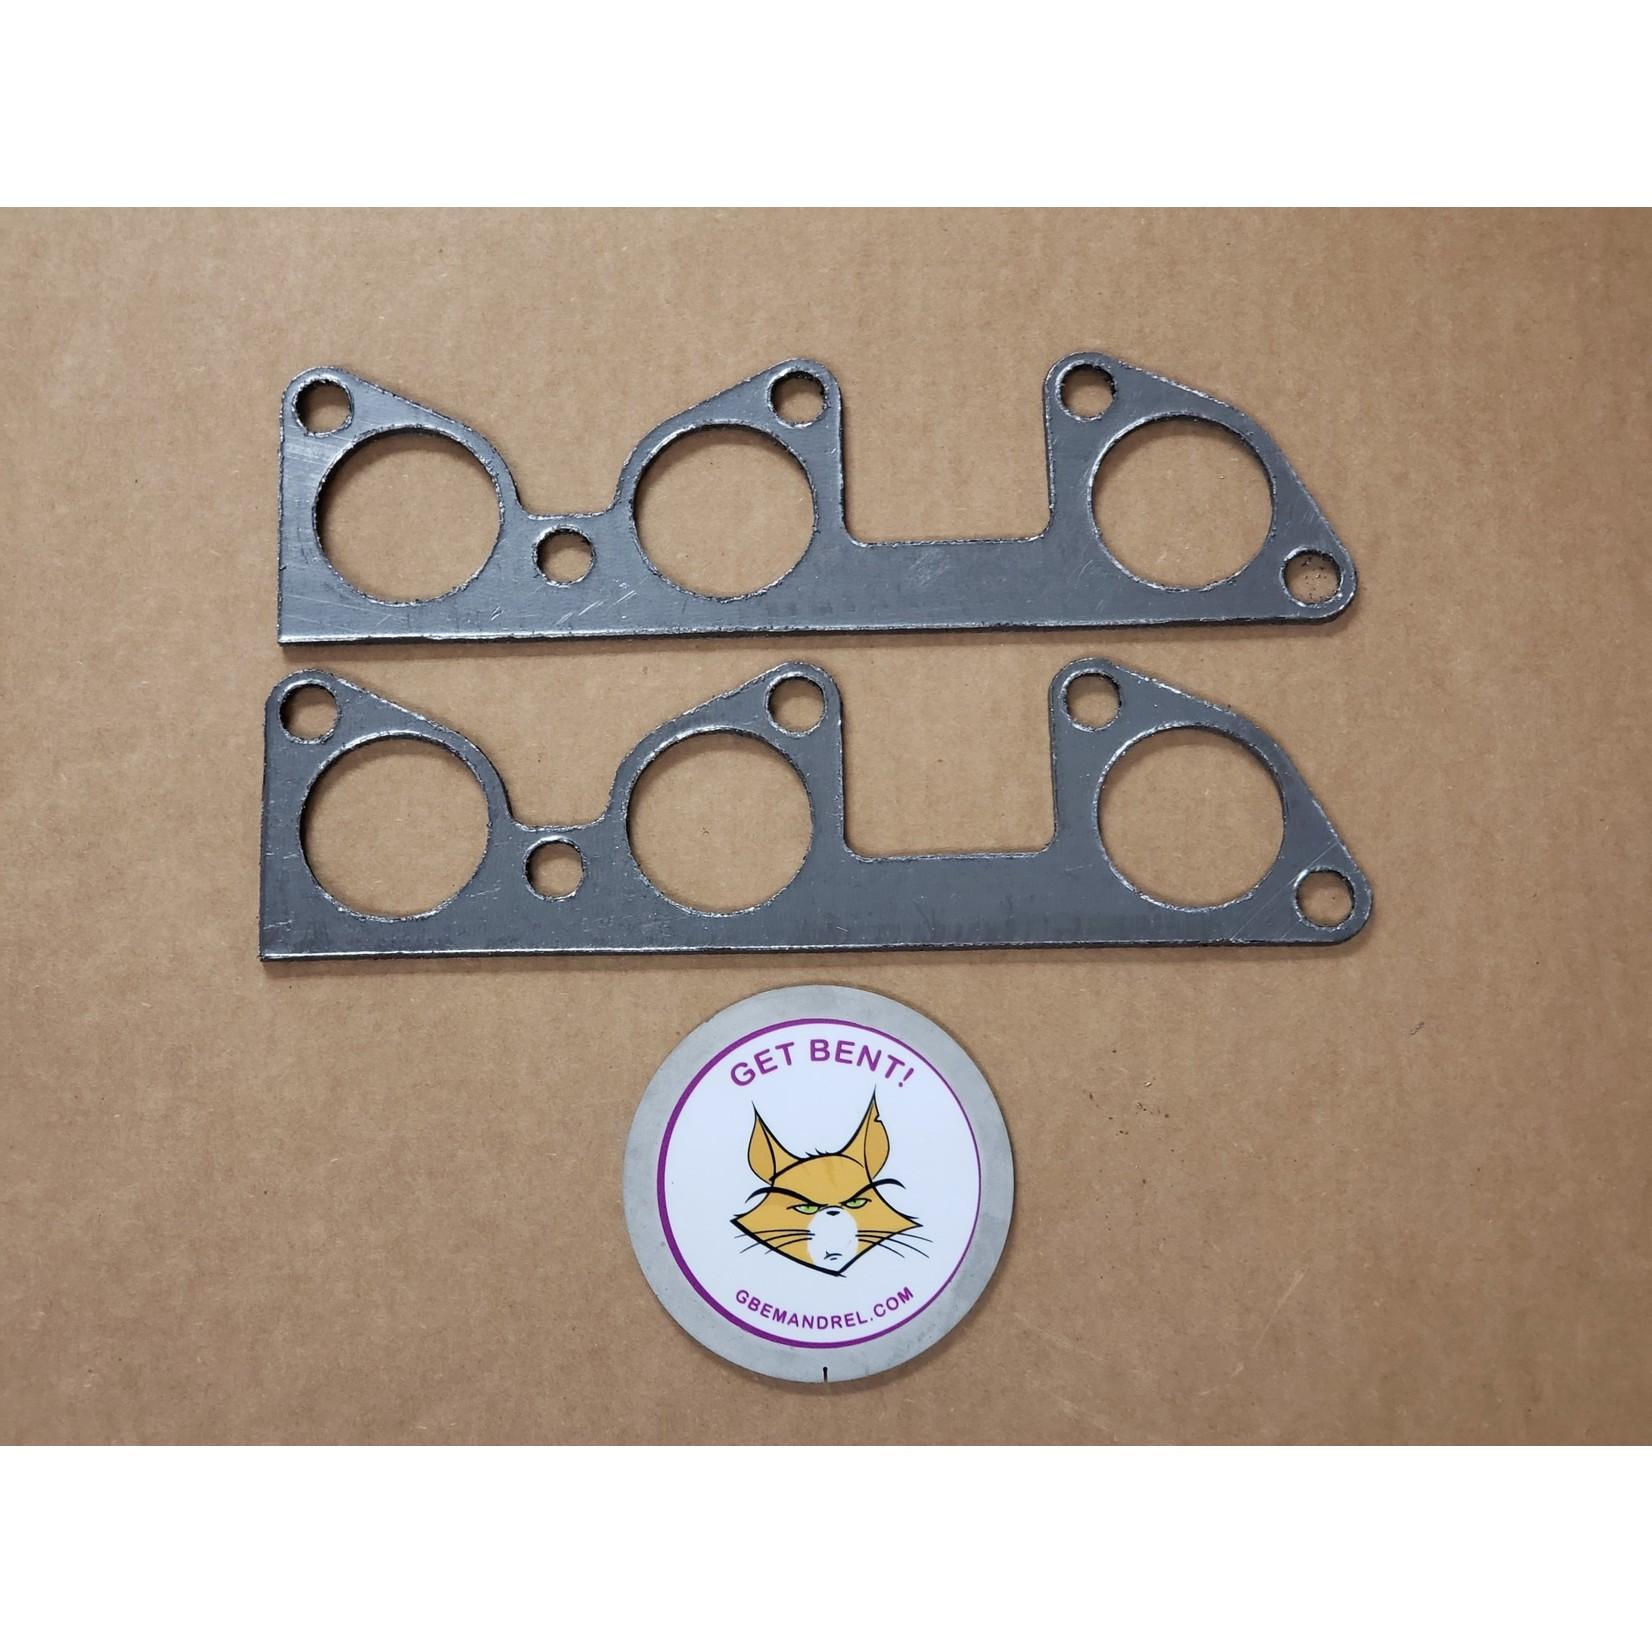 GBE JEEP TORNADO 62-73 230.5 CID GRAPHITE GASKETS